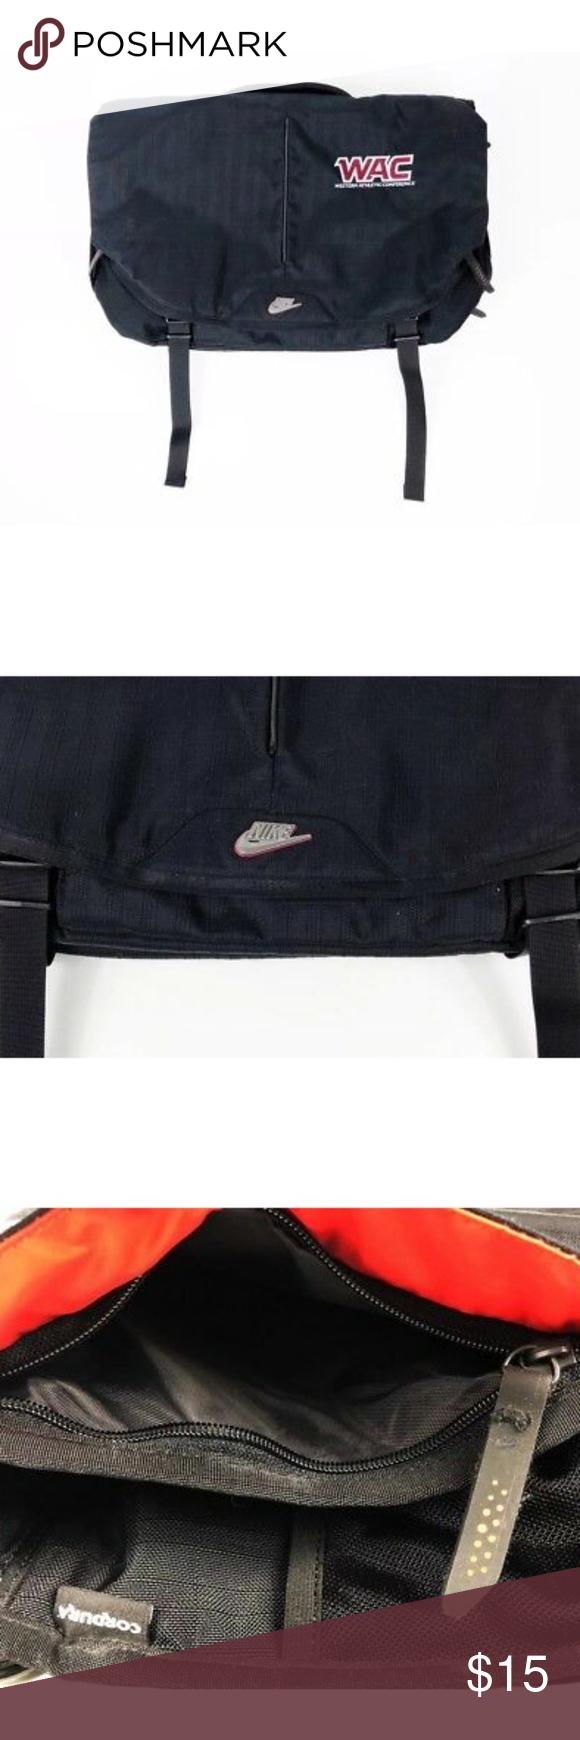 NIKE Crossbody Bag Shoulder Messenger Tote Laptop • Brand  Nike • Style  Cordura  Nylon c7742ca10759a